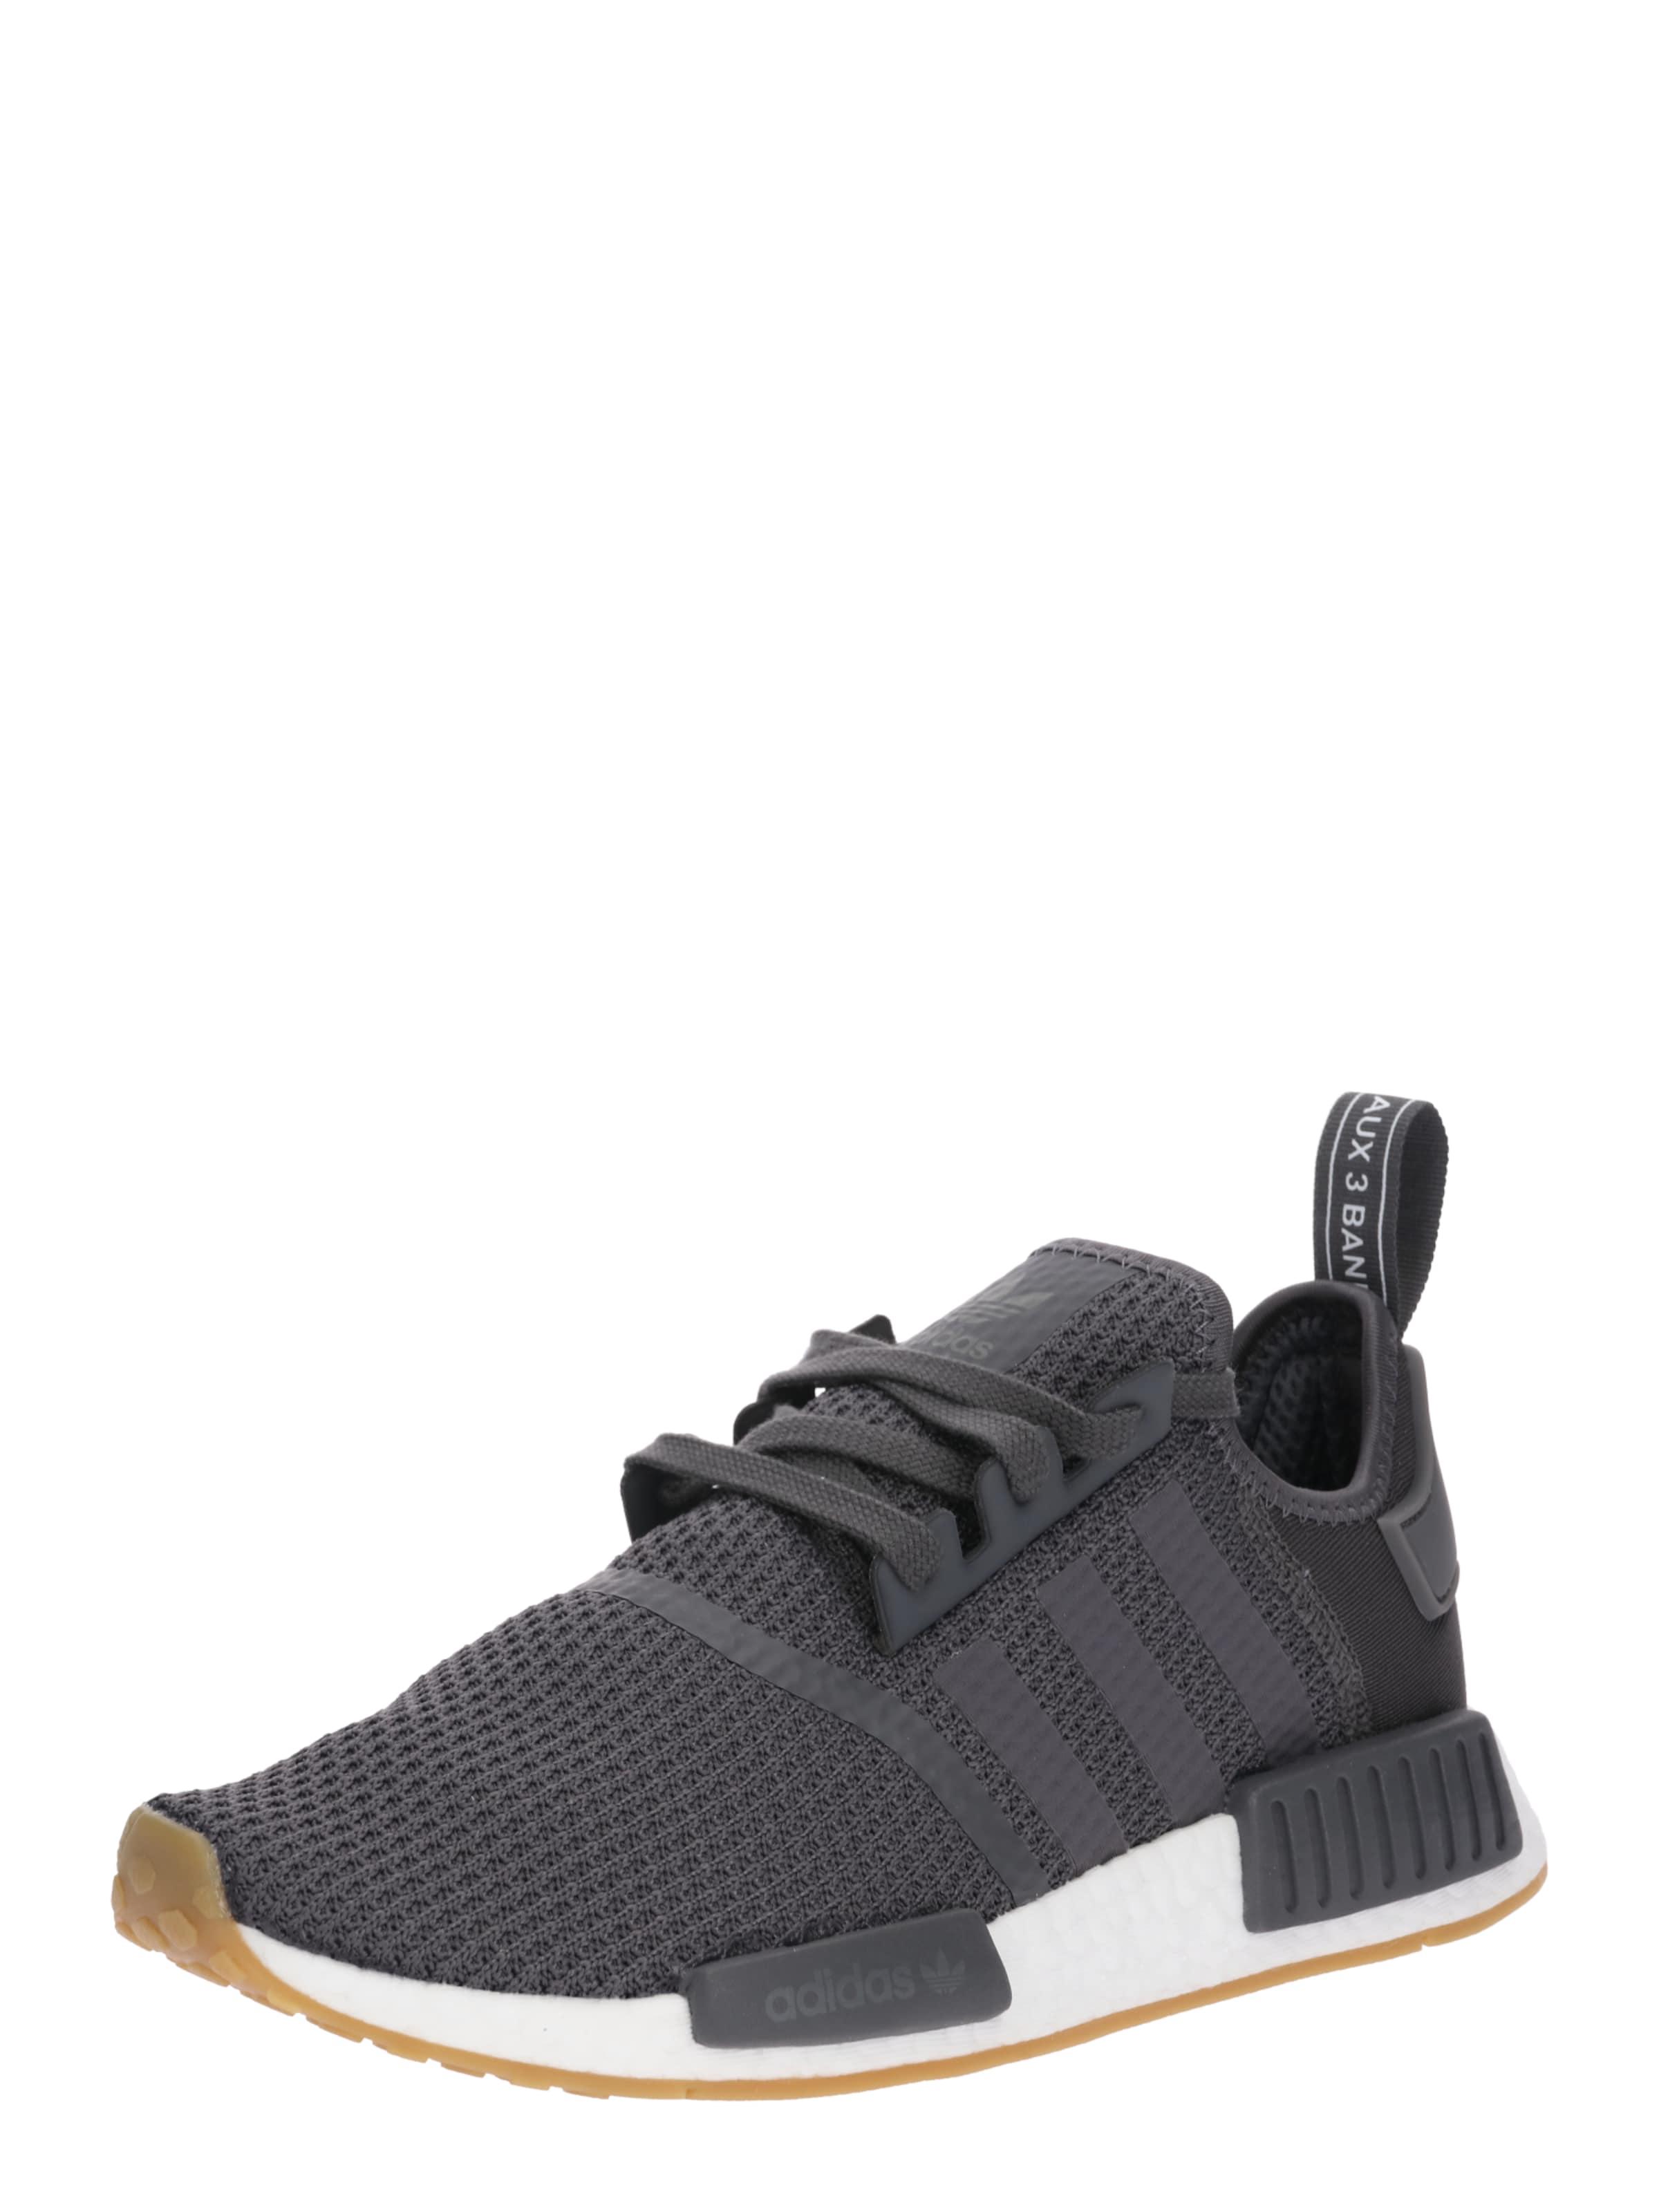 'nmd In AnthrazitWeiß Sneaker Adidas Originals r1' N80wkXnOPZ